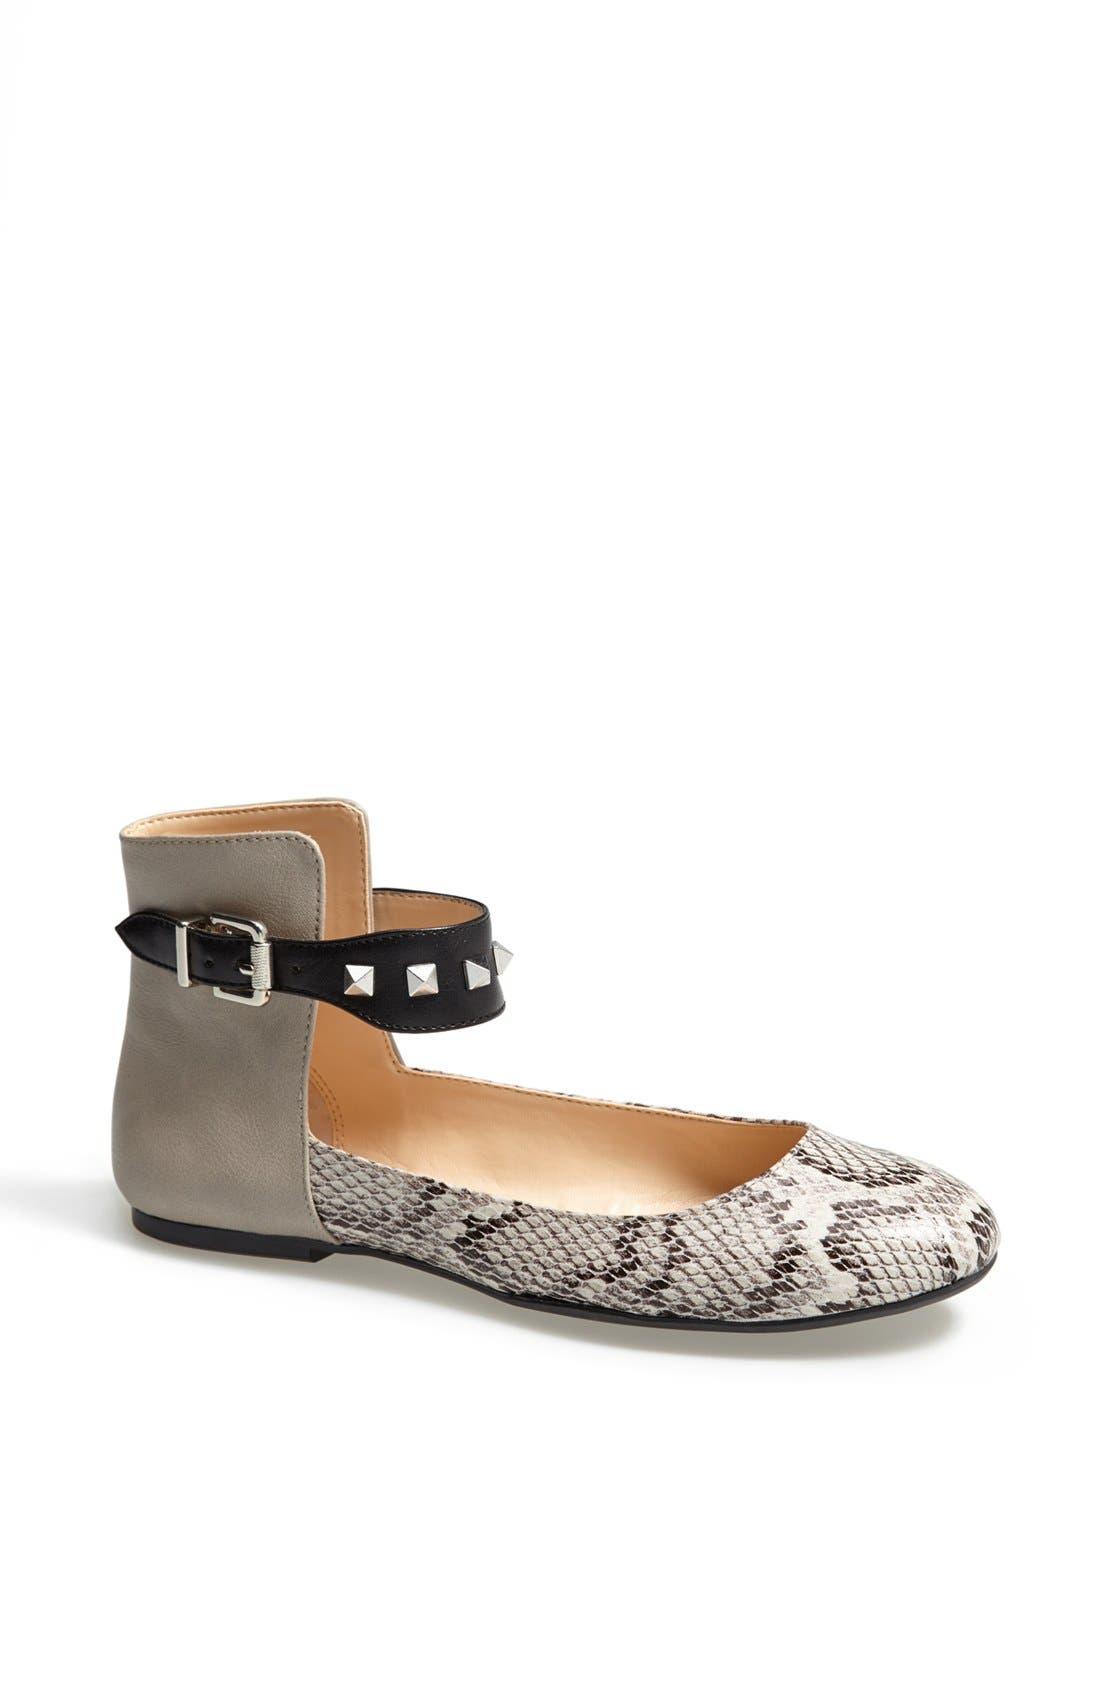 Main Image - Jessica Simpson 'Munney' Studded Ankle Strap Flat